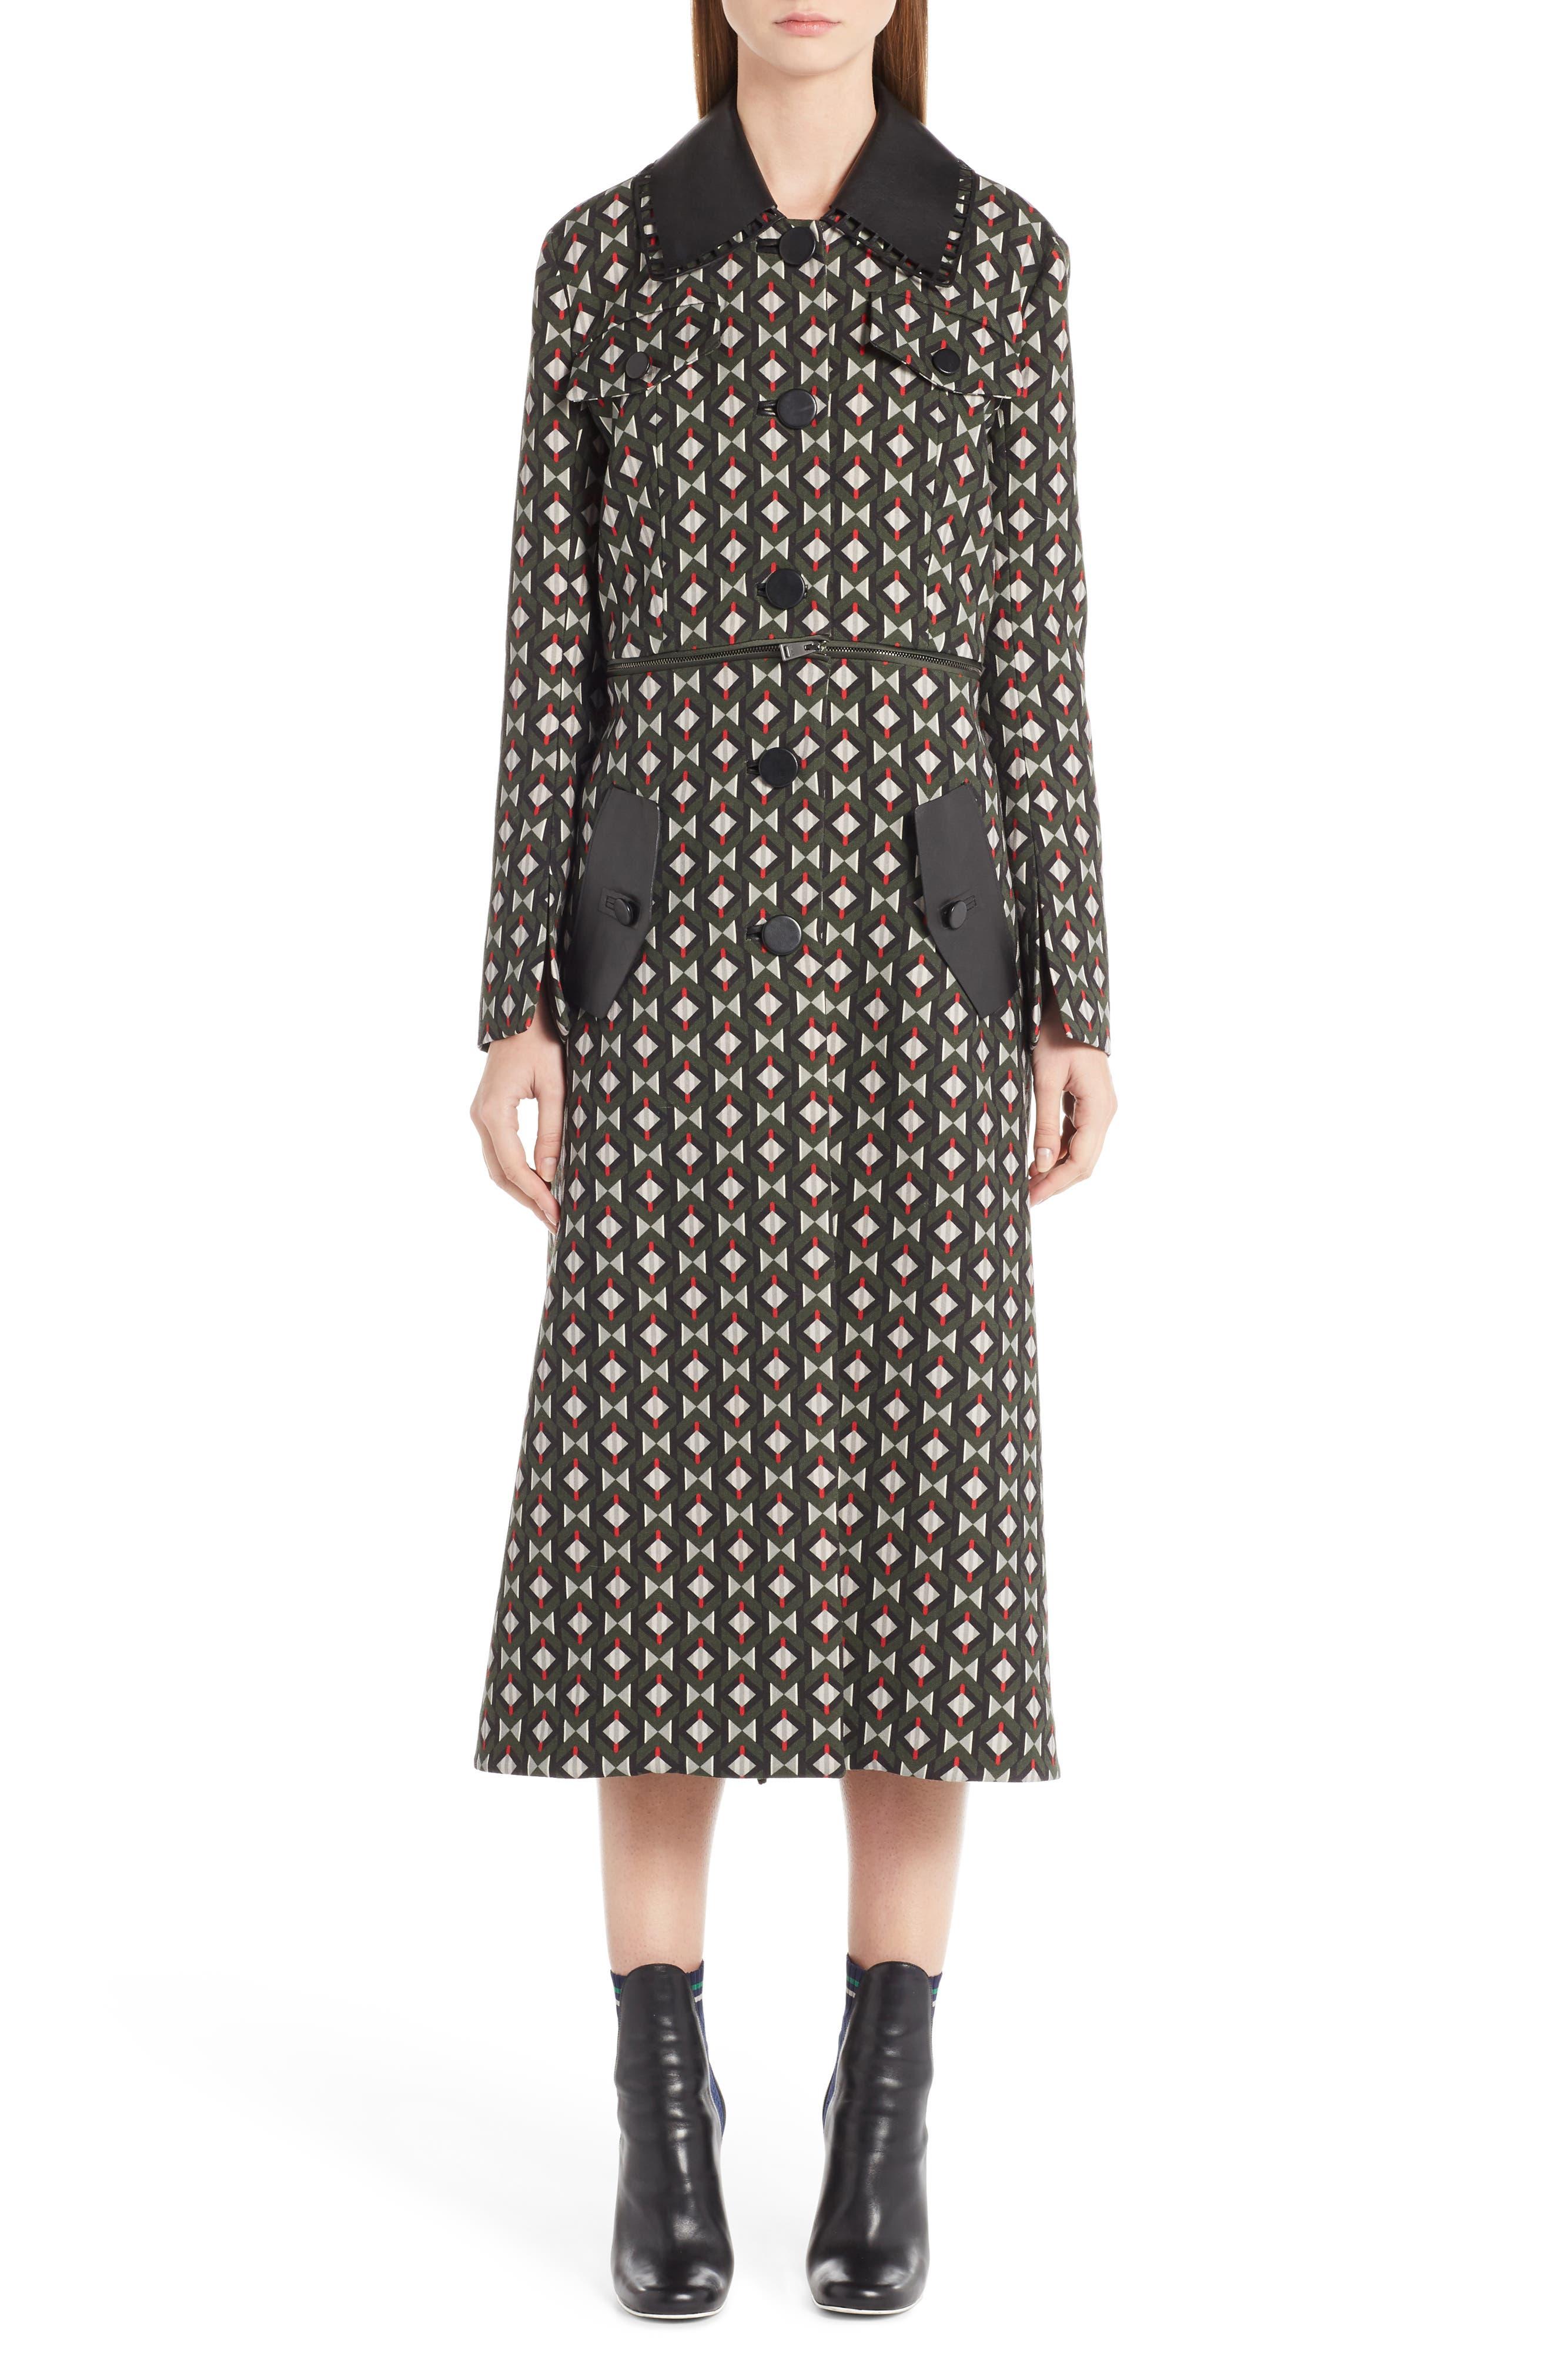 Fendi Double Face Wool & Silk Coat with Zip-Off Hem